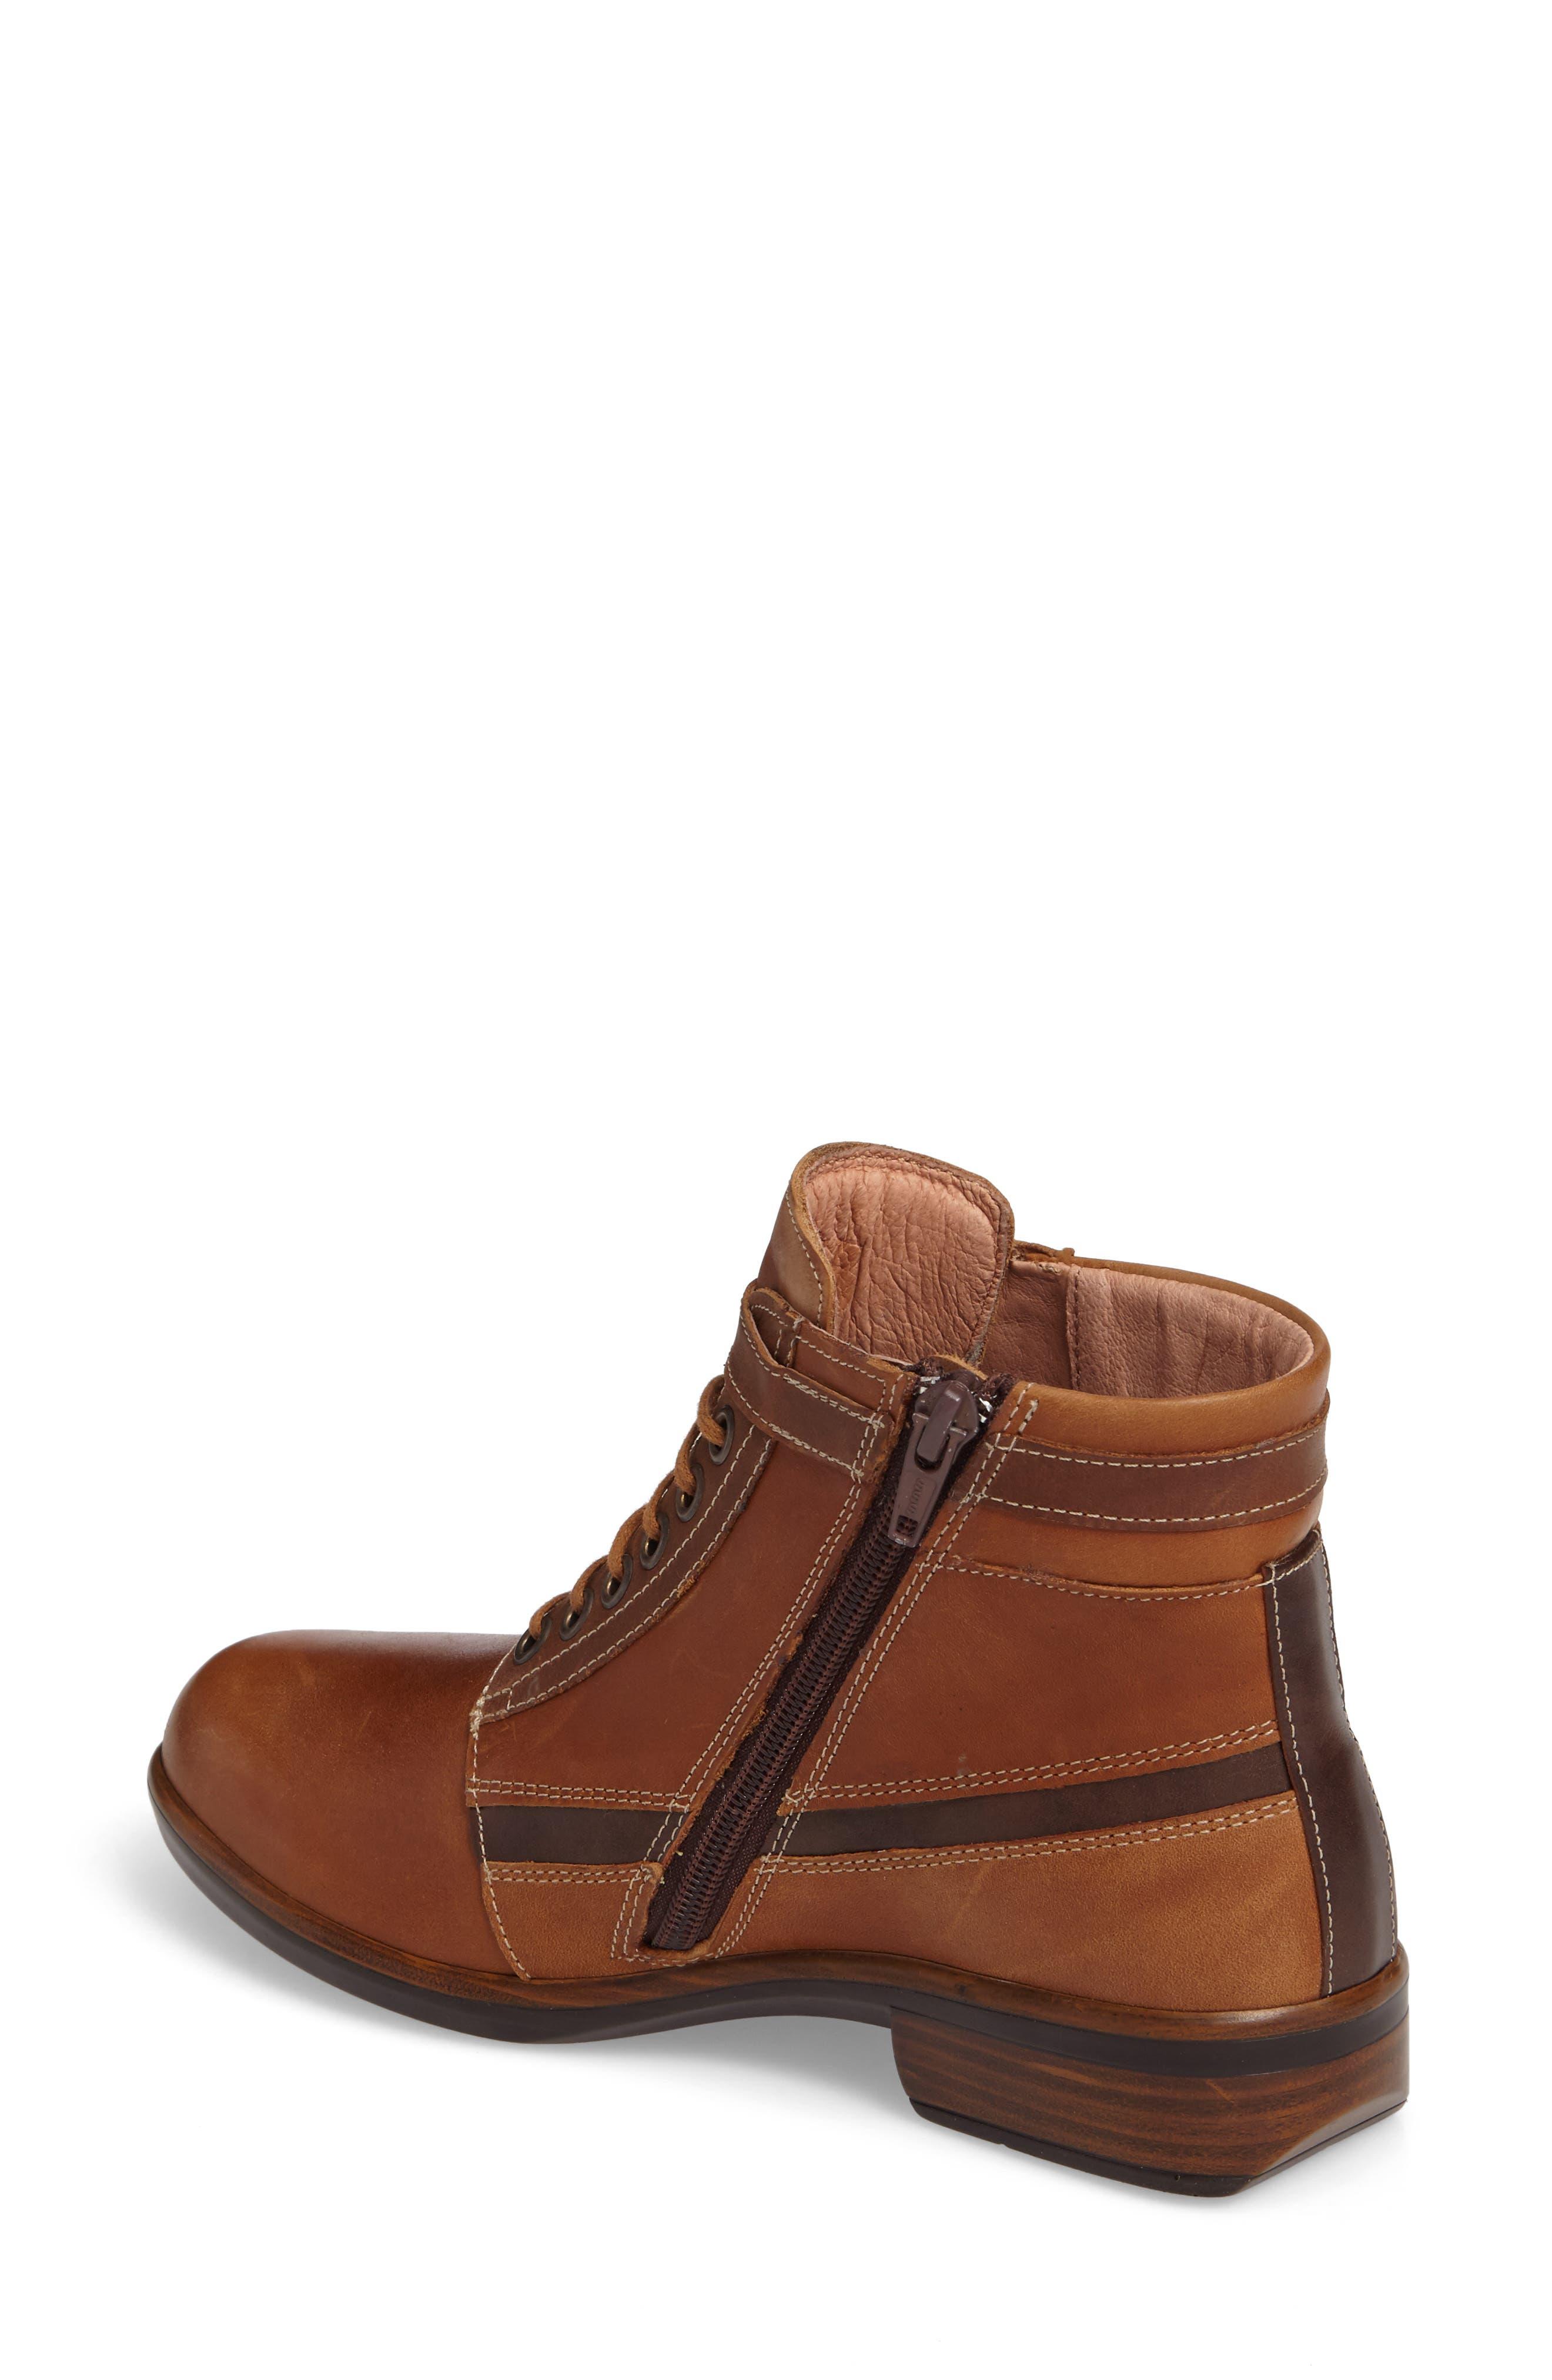 Kona Boot,                             Alternate thumbnail 2, color,                             Vintage Camel Leather